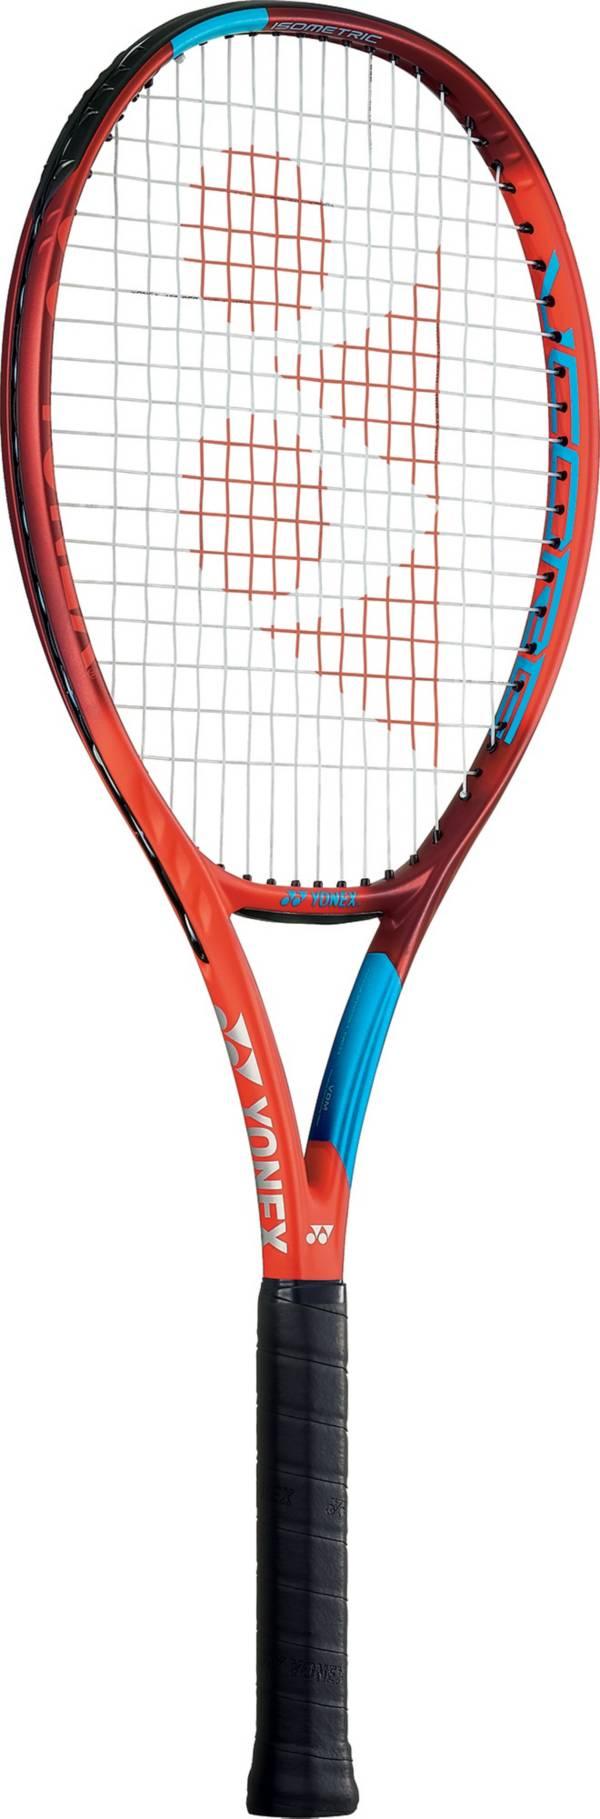 Yonex VCORE Feel Tennis Racquet product image